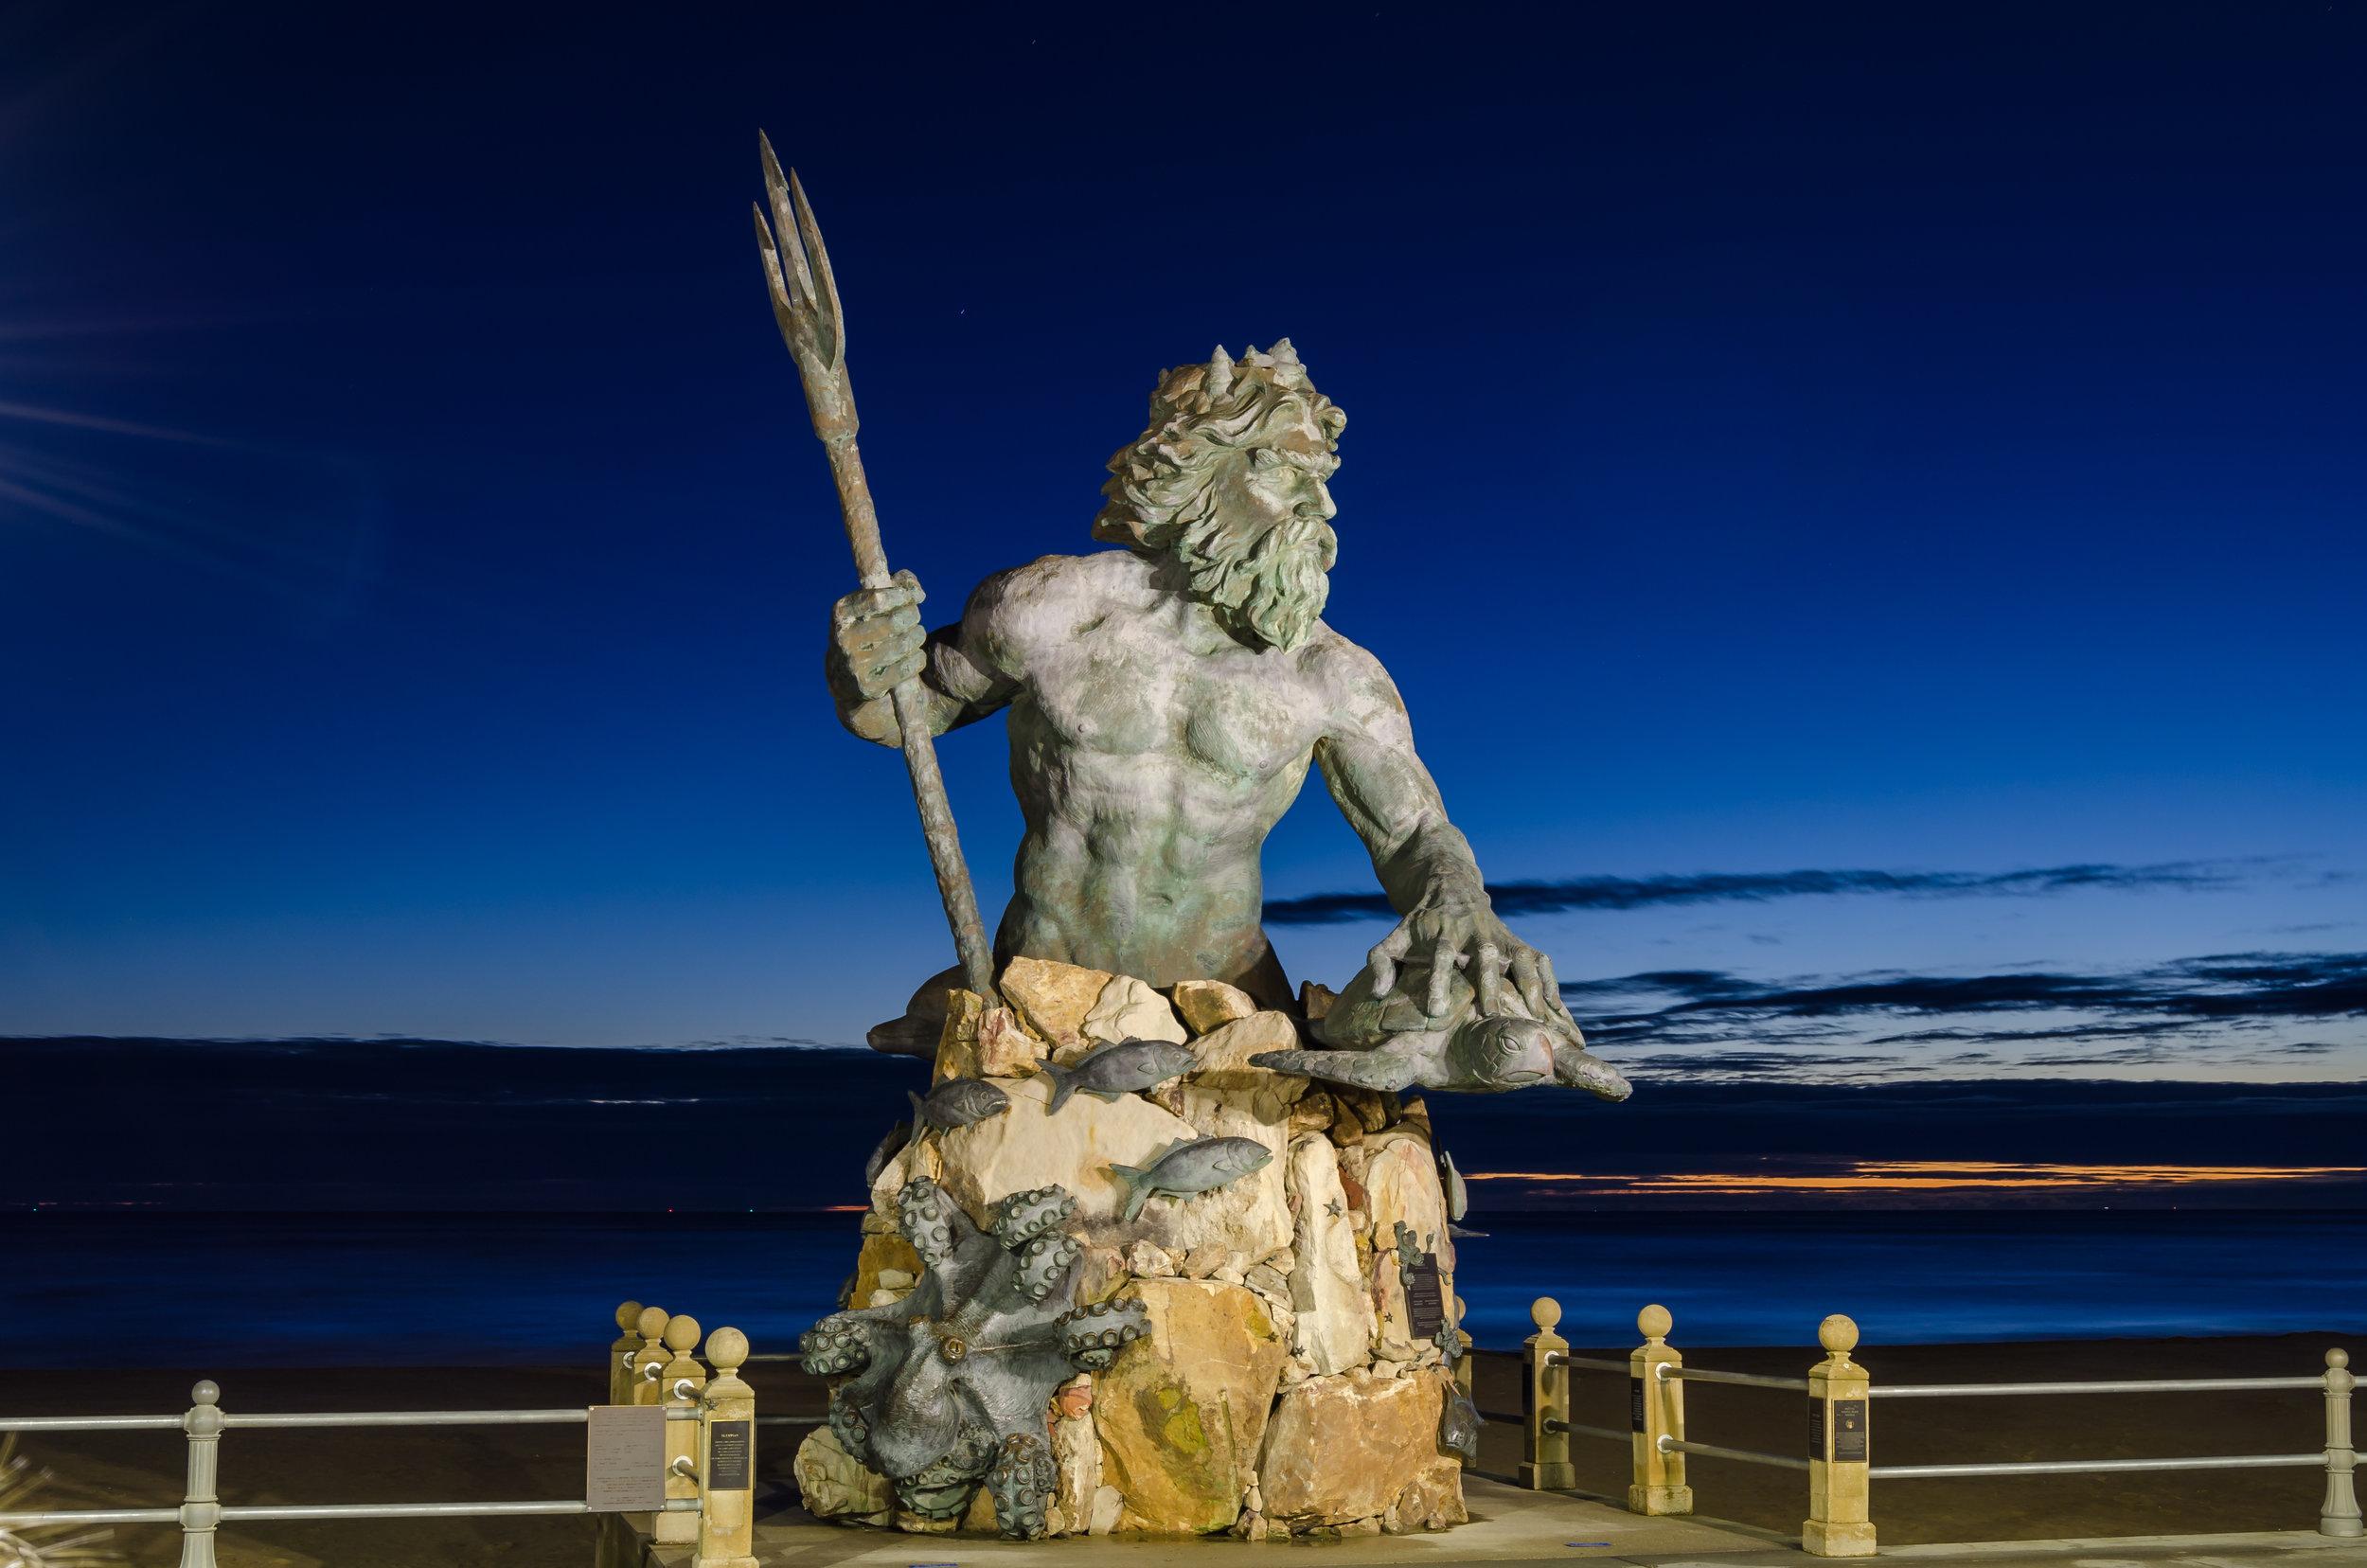 King Neptune-Neptune-statue-sunrise-dawn-Virginia Beach-beach-Virginia.jpg